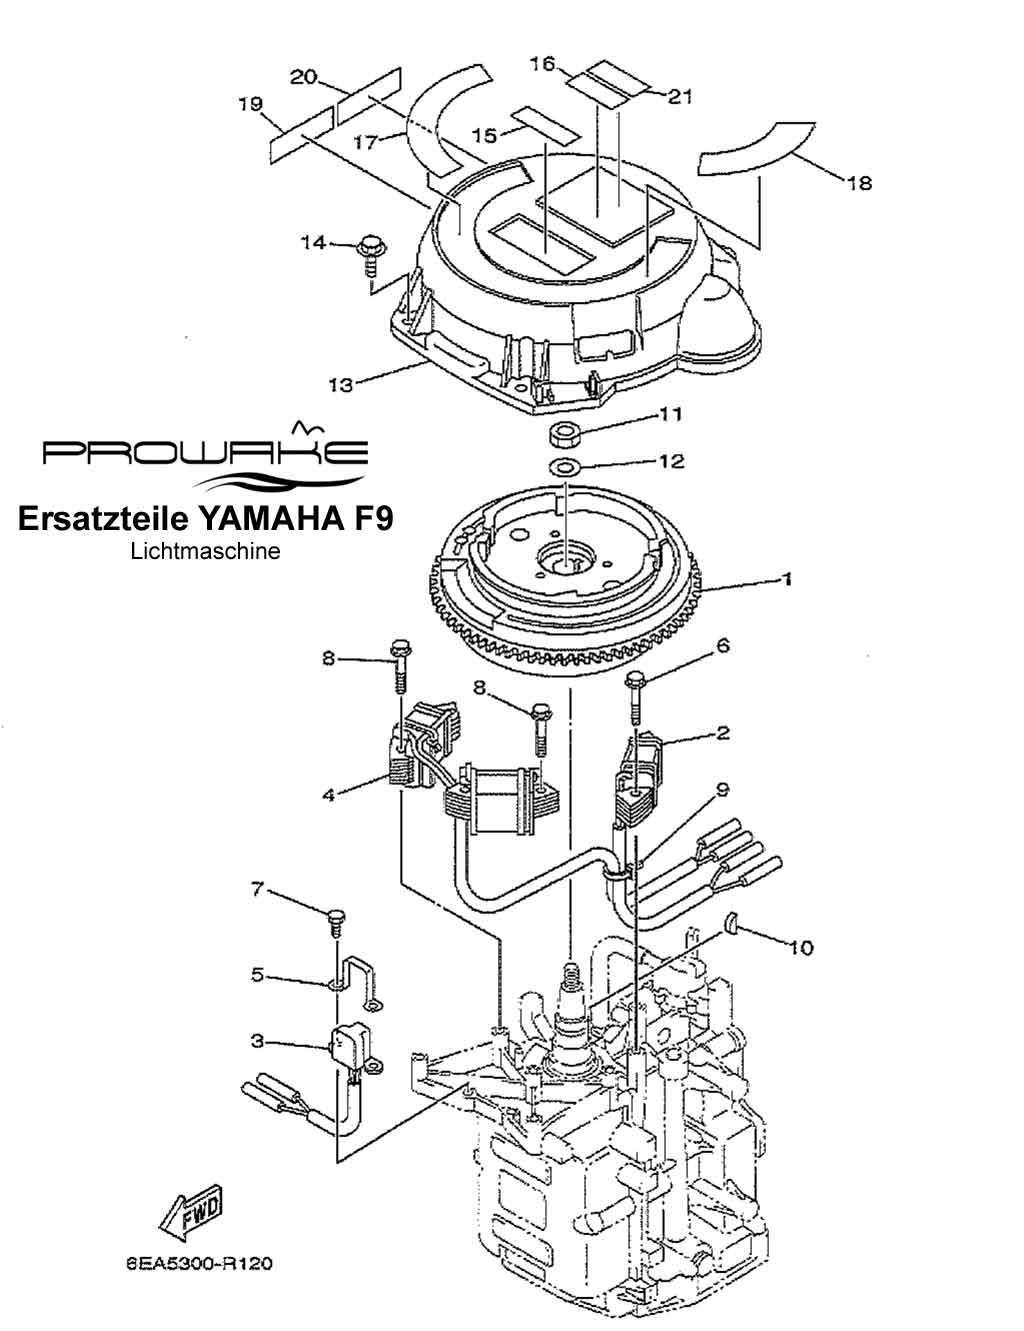 yamaha f9 9 au enborder lichtmaschine ersatzteil. Black Bedroom Furniture Sets. Home Design Ideas